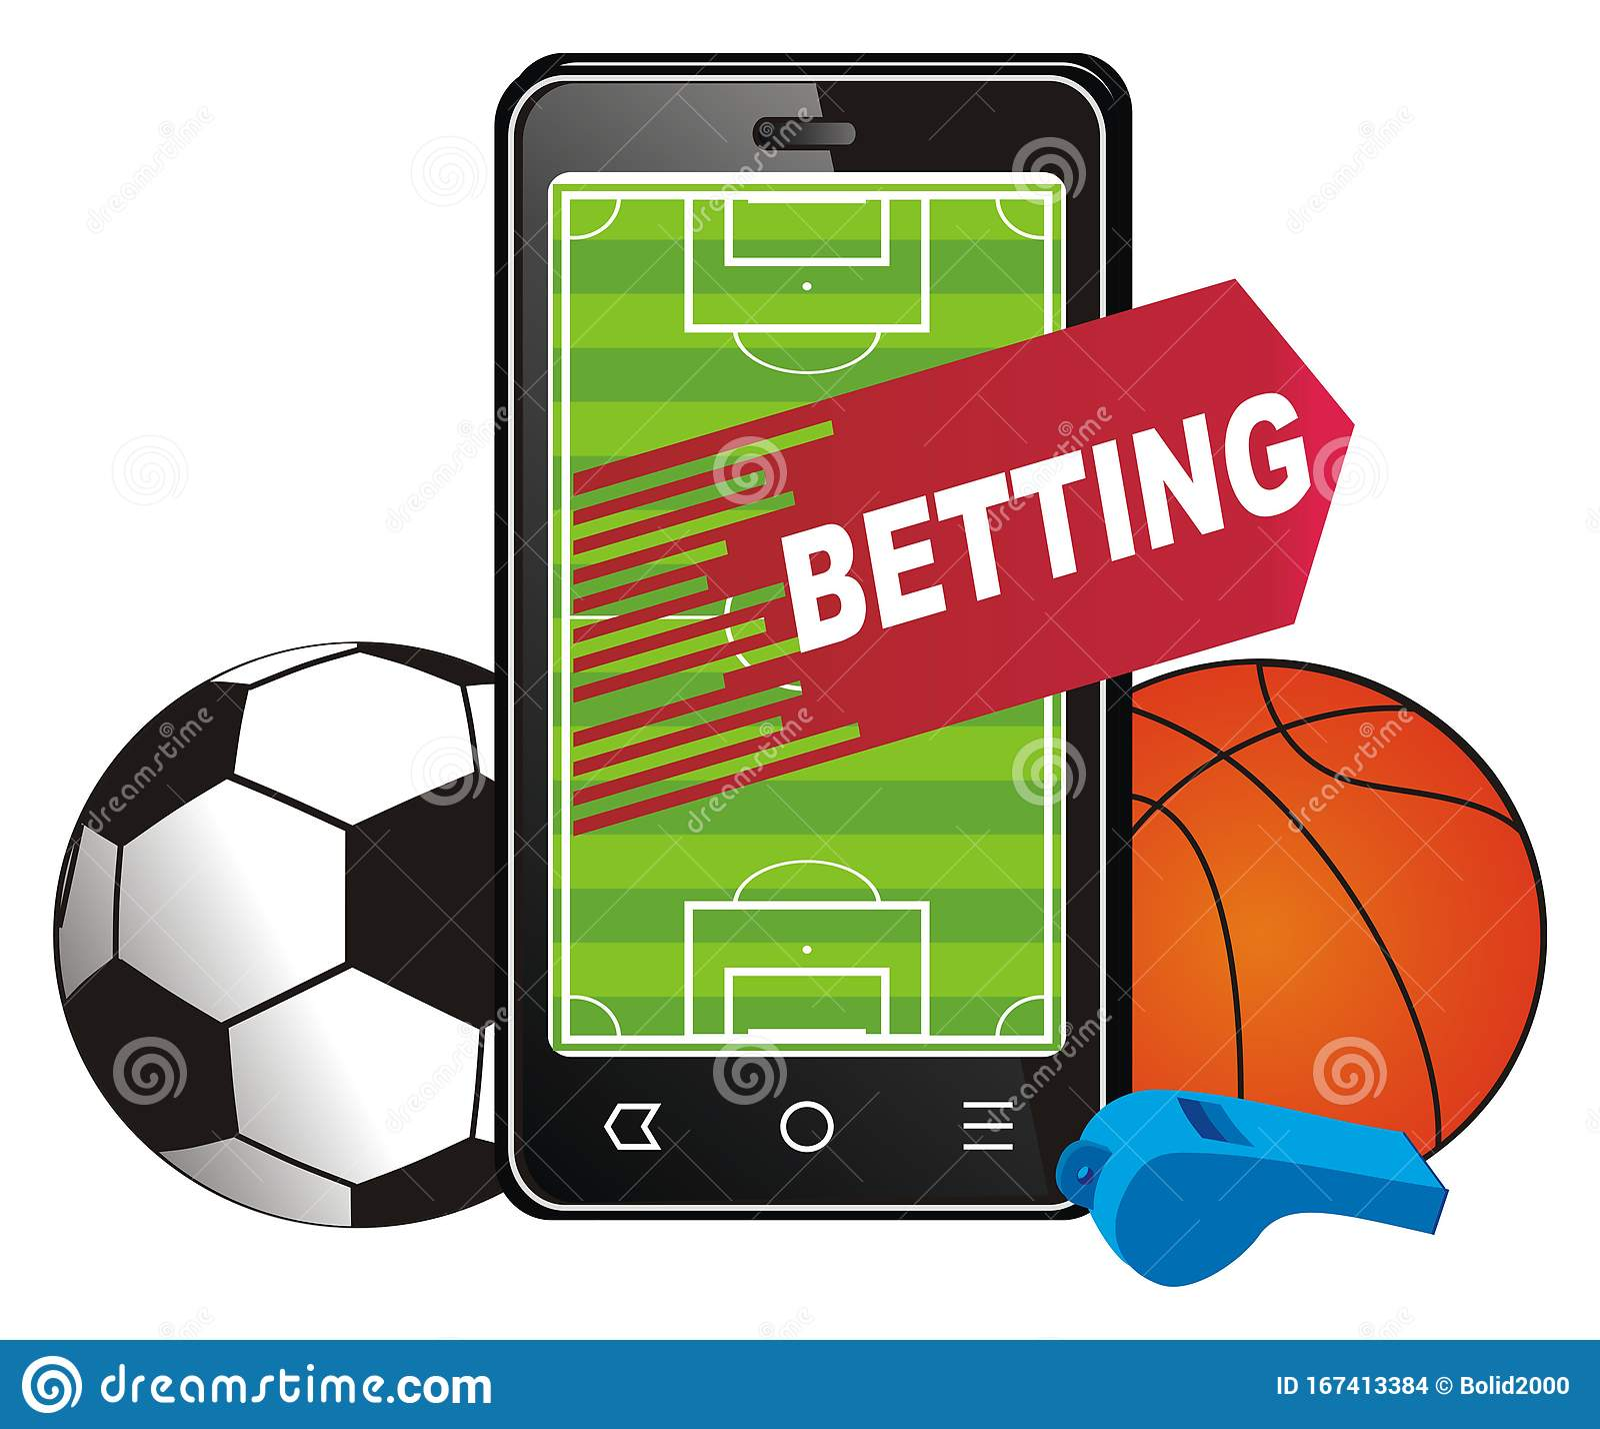 Itsagoal betting line huesca vs villarreal betting expert nba